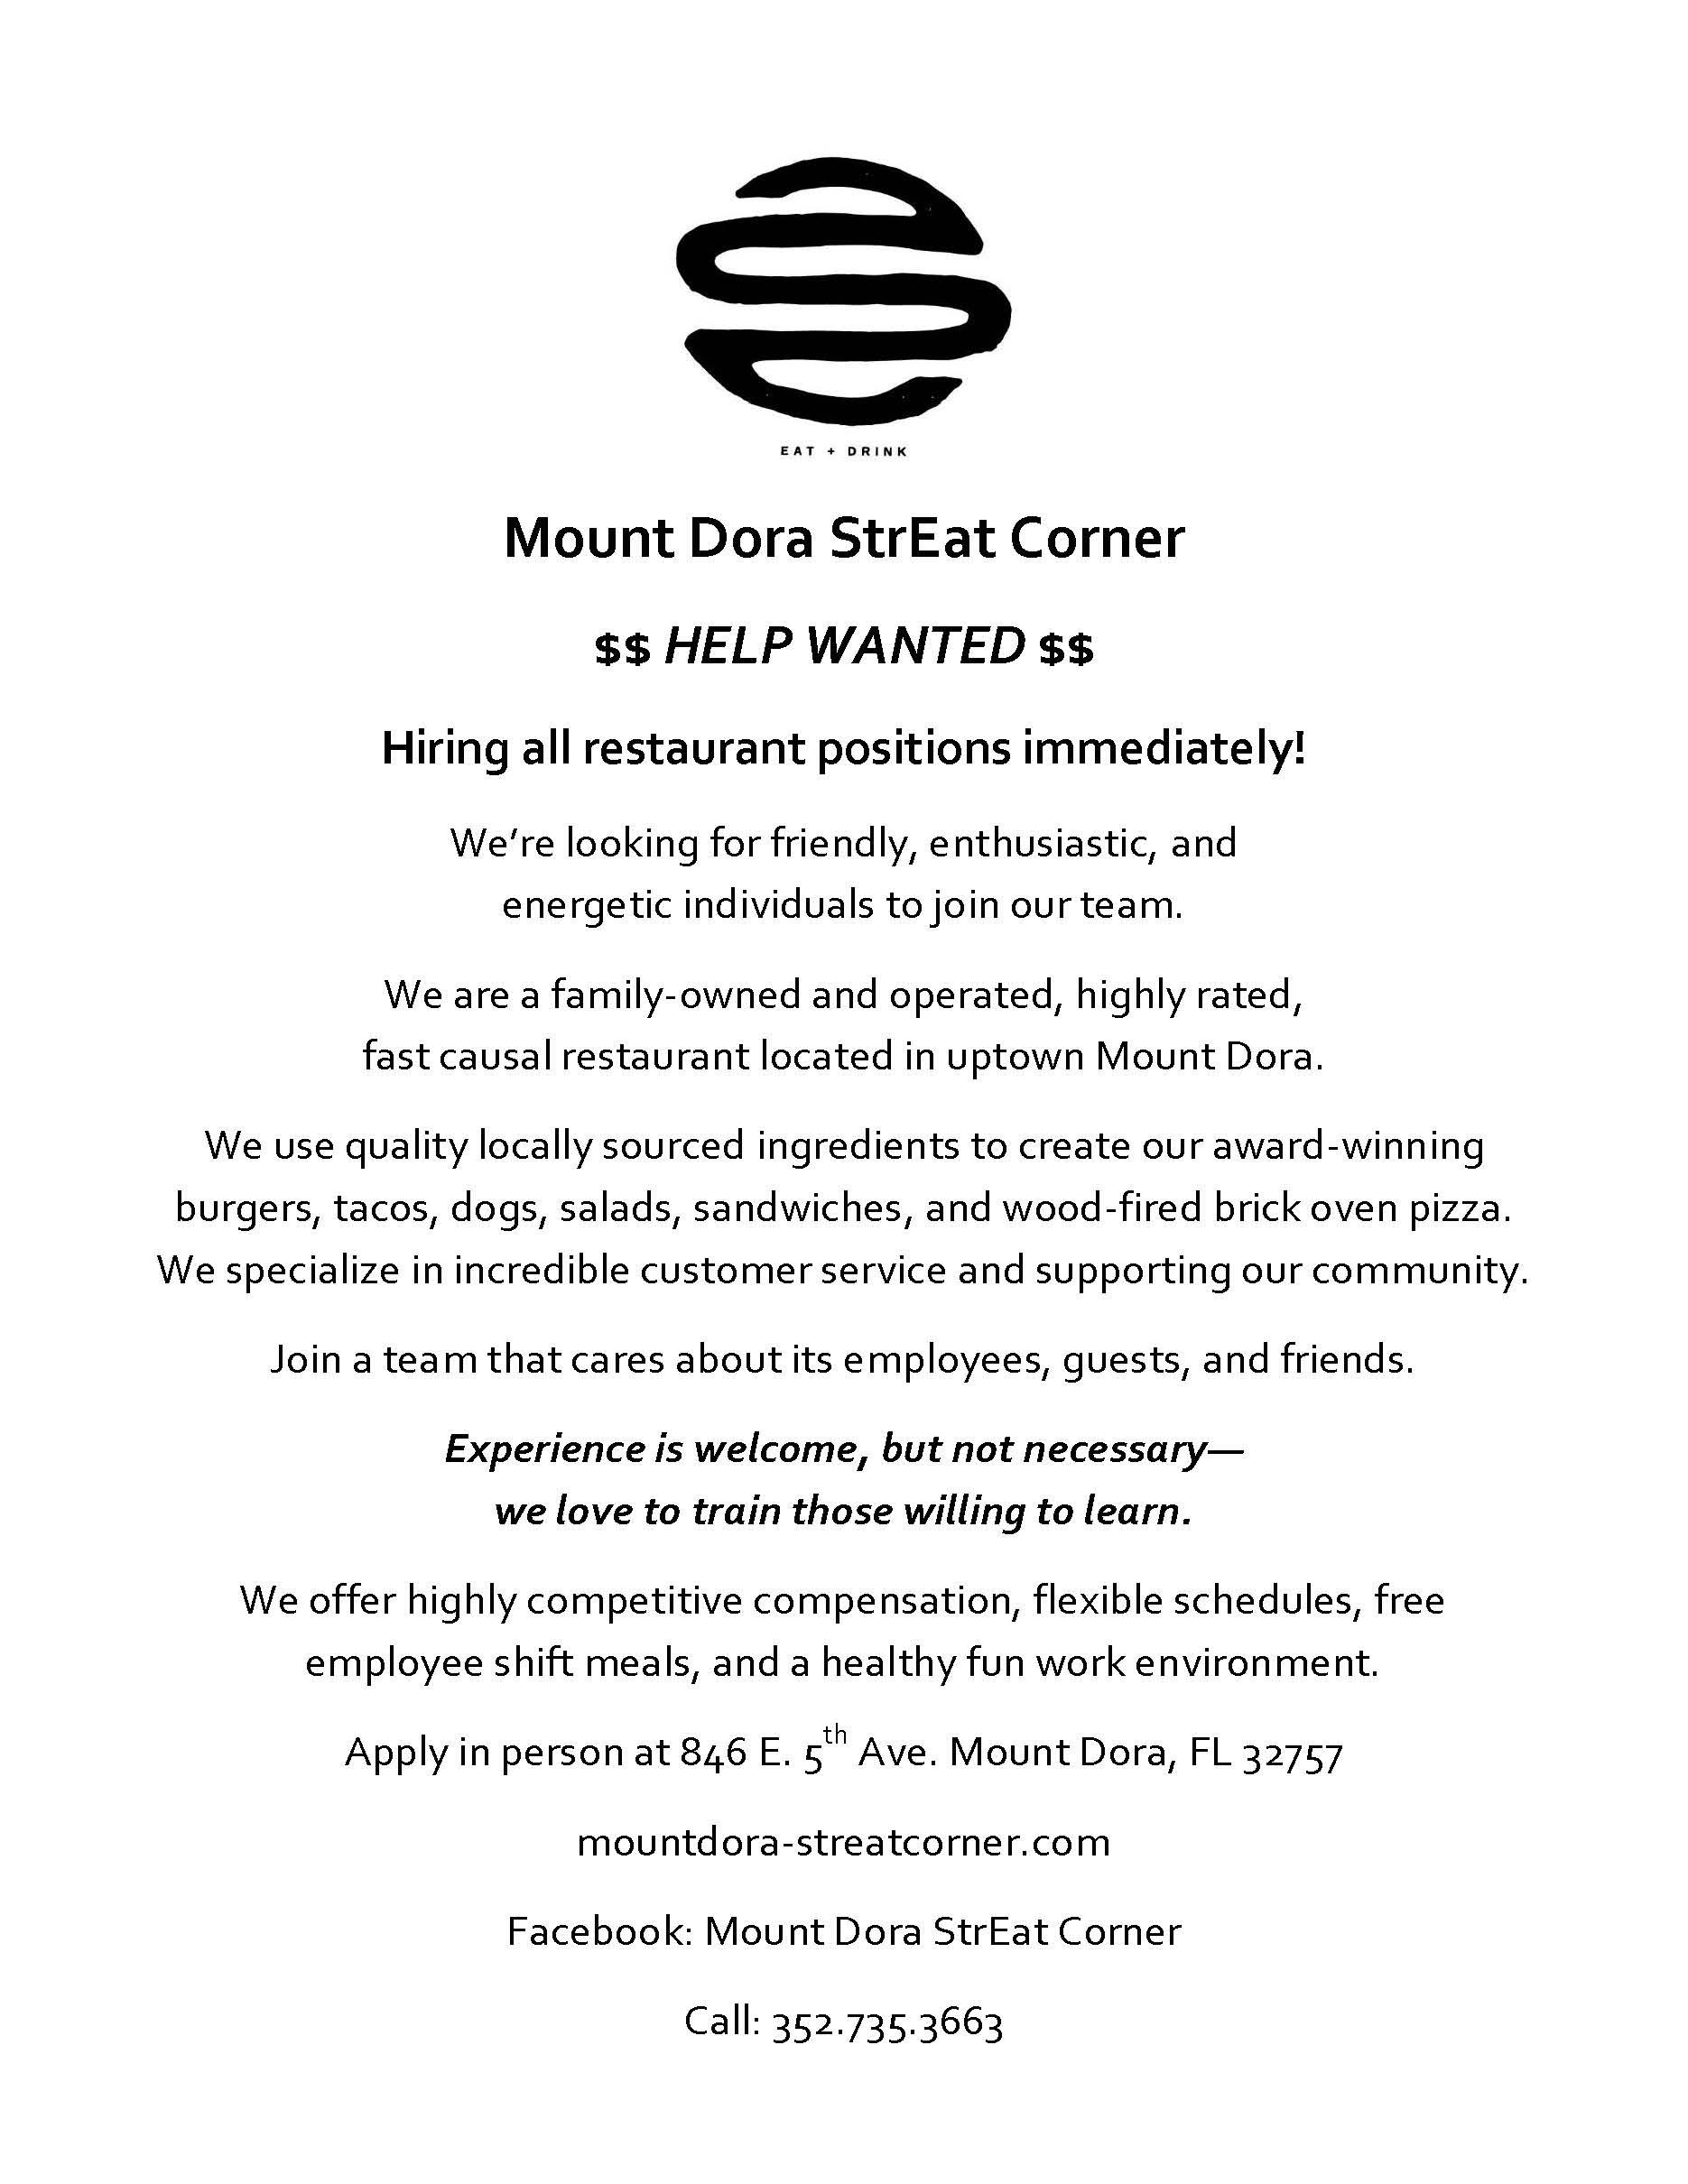 Mount Dora StrEat Corner Hiring